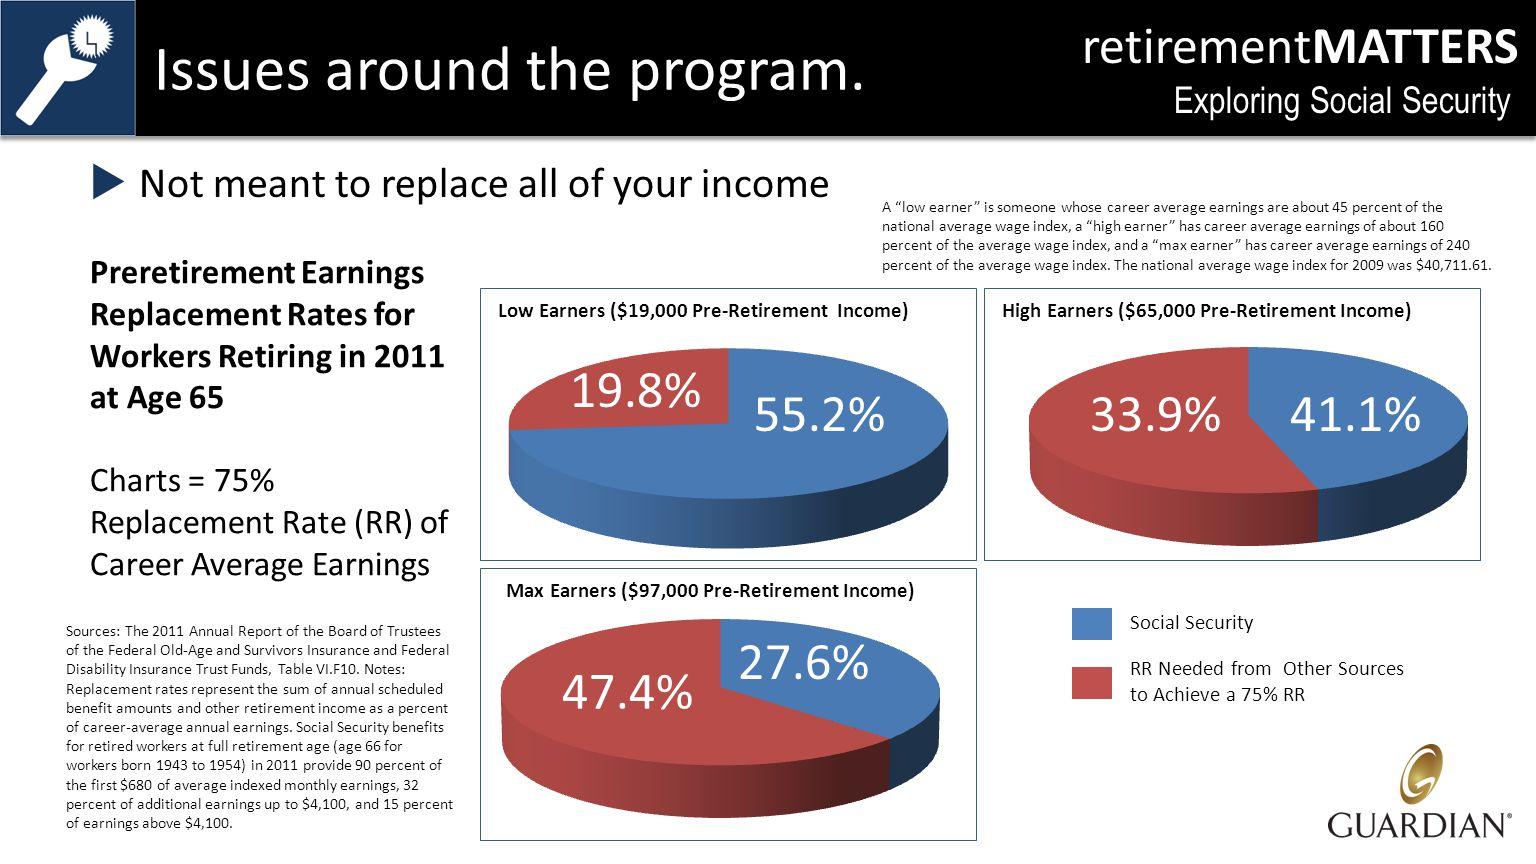 RetirementMATTERS  Exploring Social Security Today, we'll explore